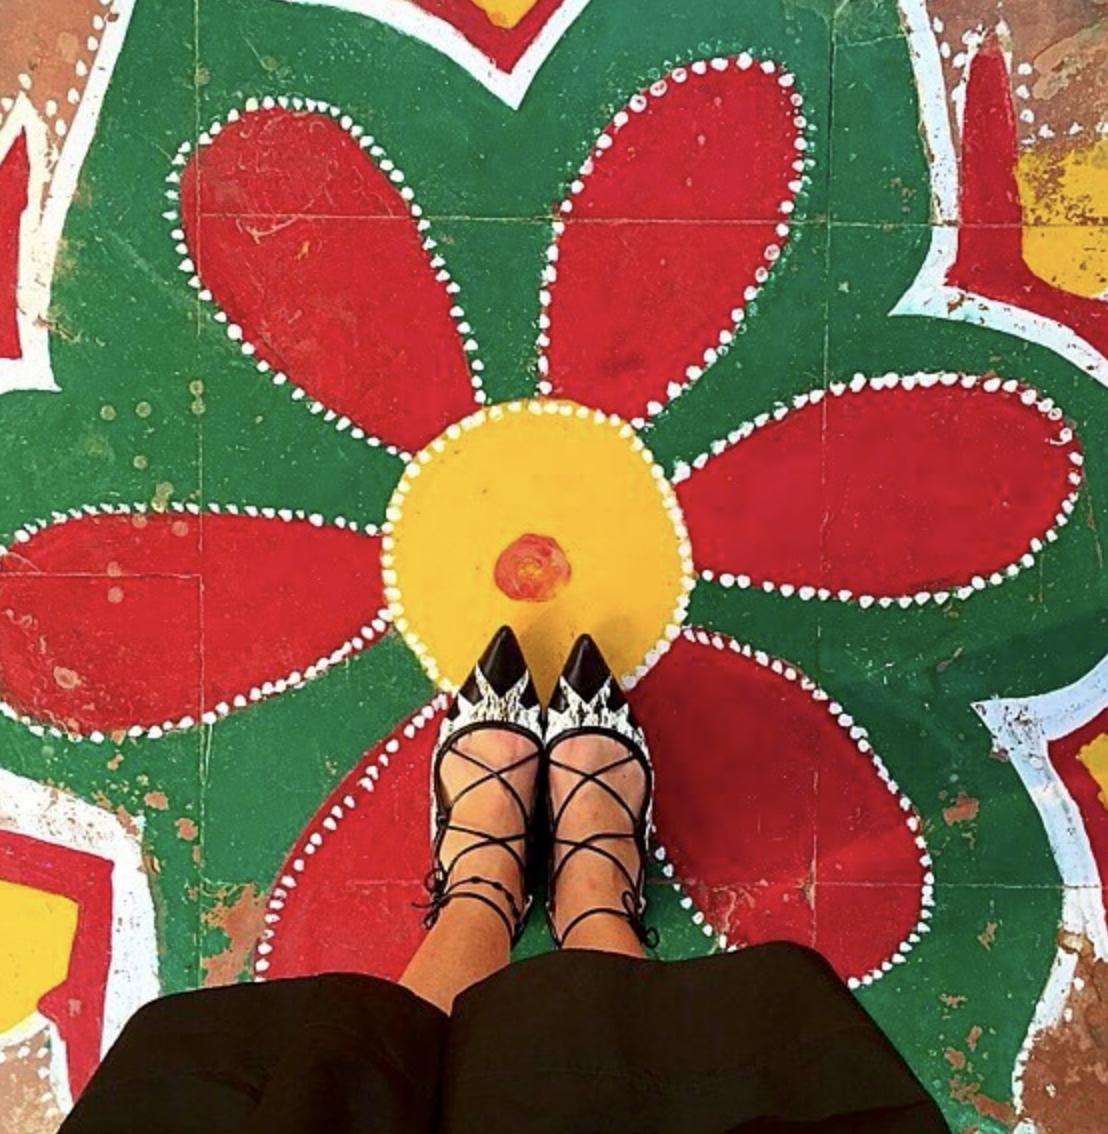 @ totallygorgeousgirl   Happy Feet!! ❤️💛💚✨  #goodmorning   #❤️   #gorgeous   #😍  #smile   #😃   #ihavethisthingwithfloors  💚  #blessed   #delhi   #patiala   #wedding  🌟